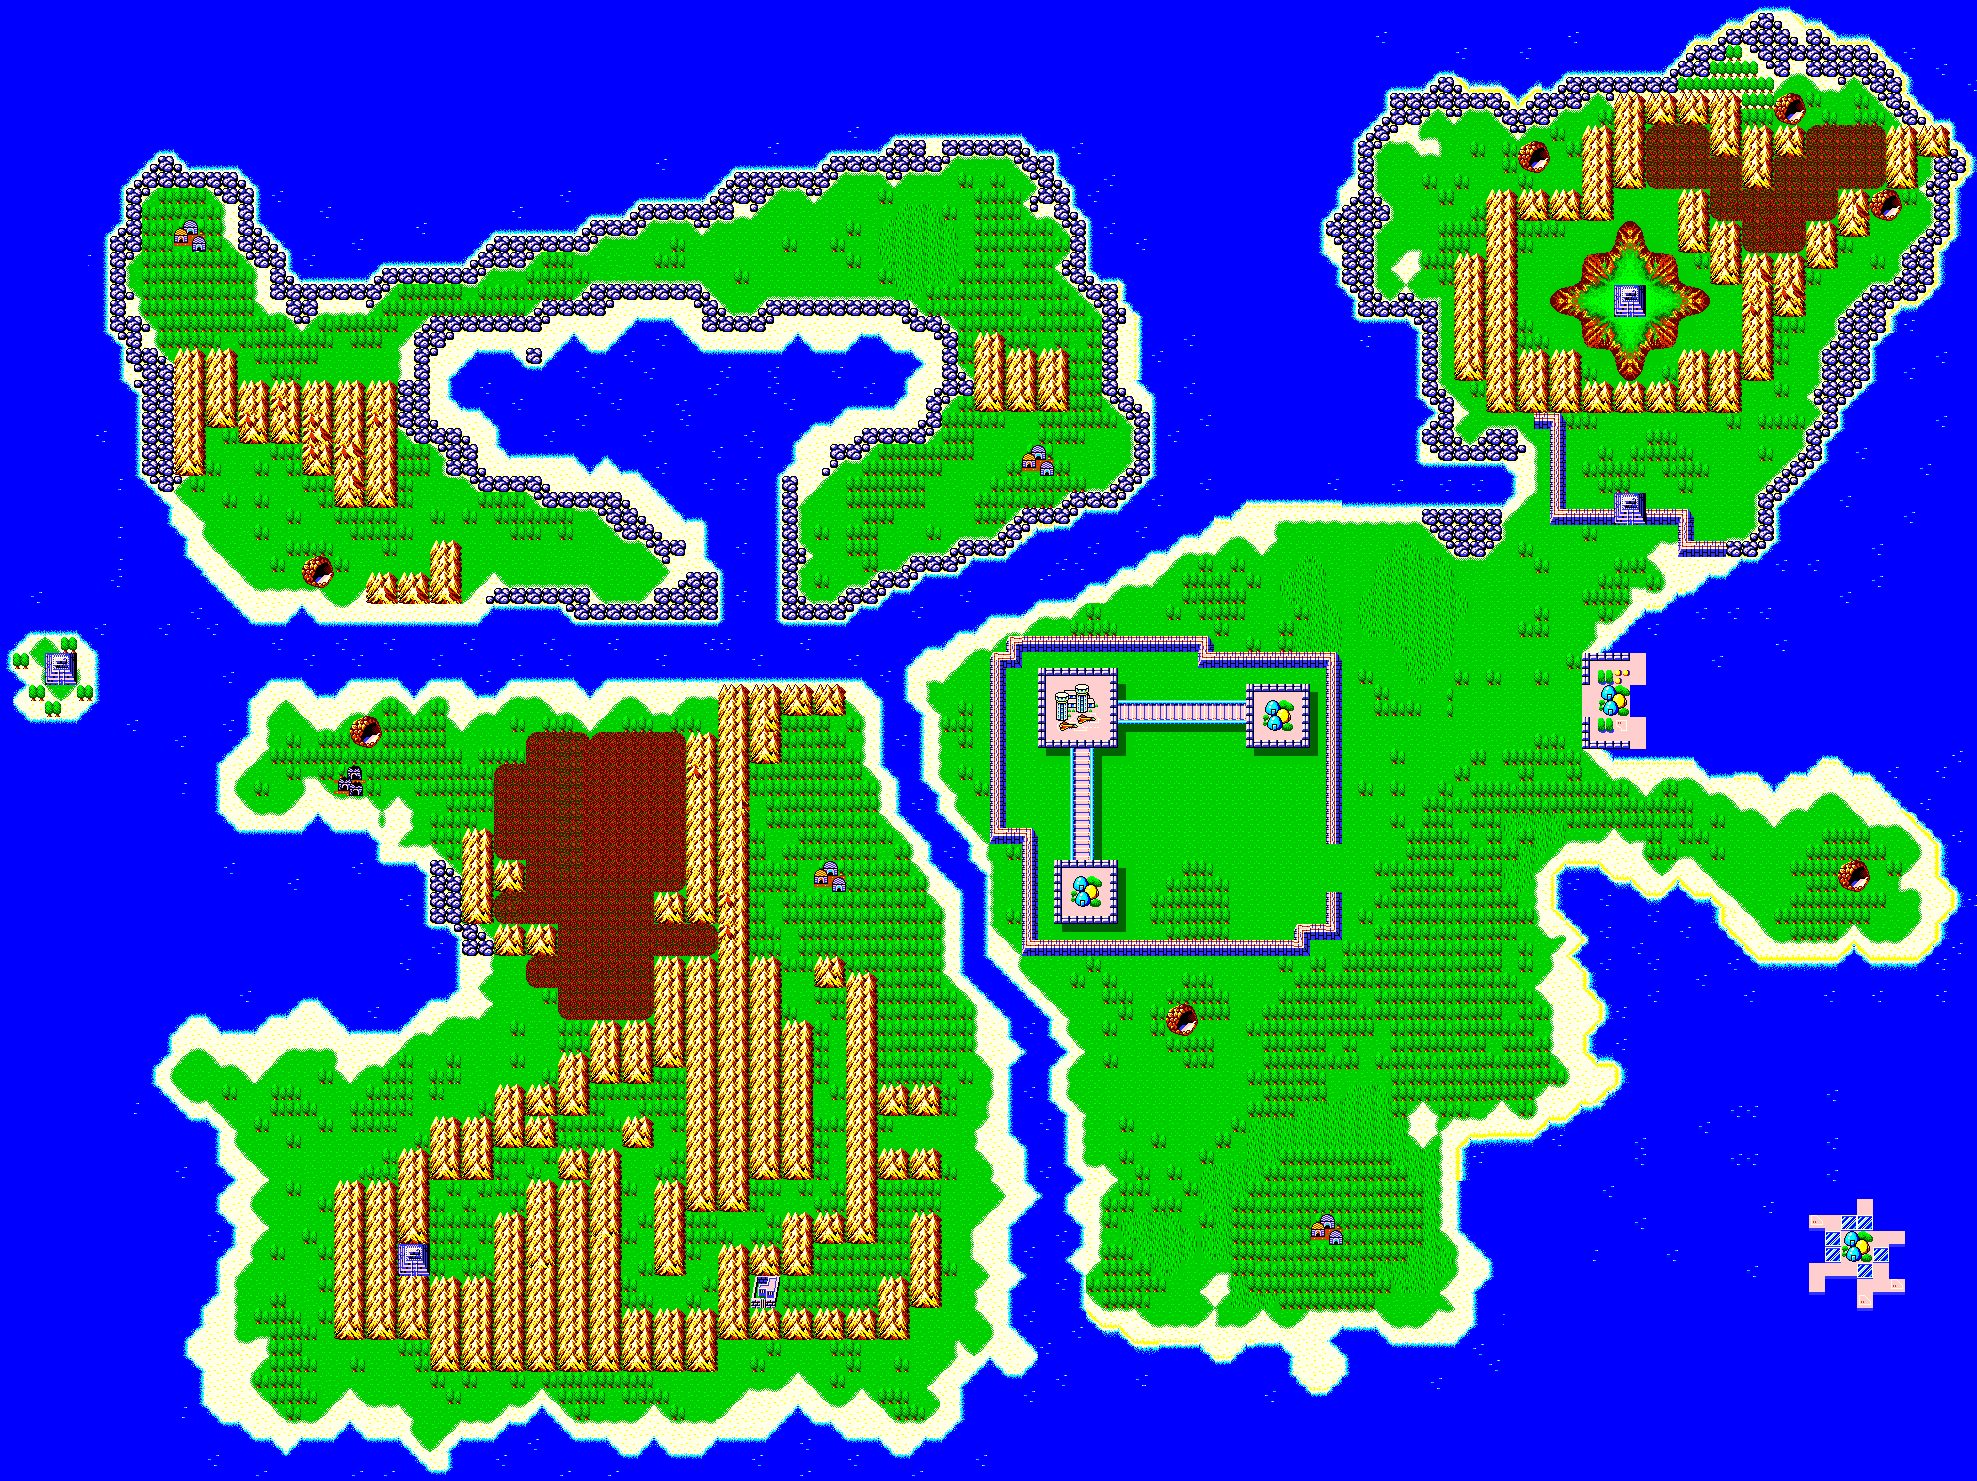 Phantasy Star 4 World Map.Phantasy Star Towns Overworlds Shops Maps